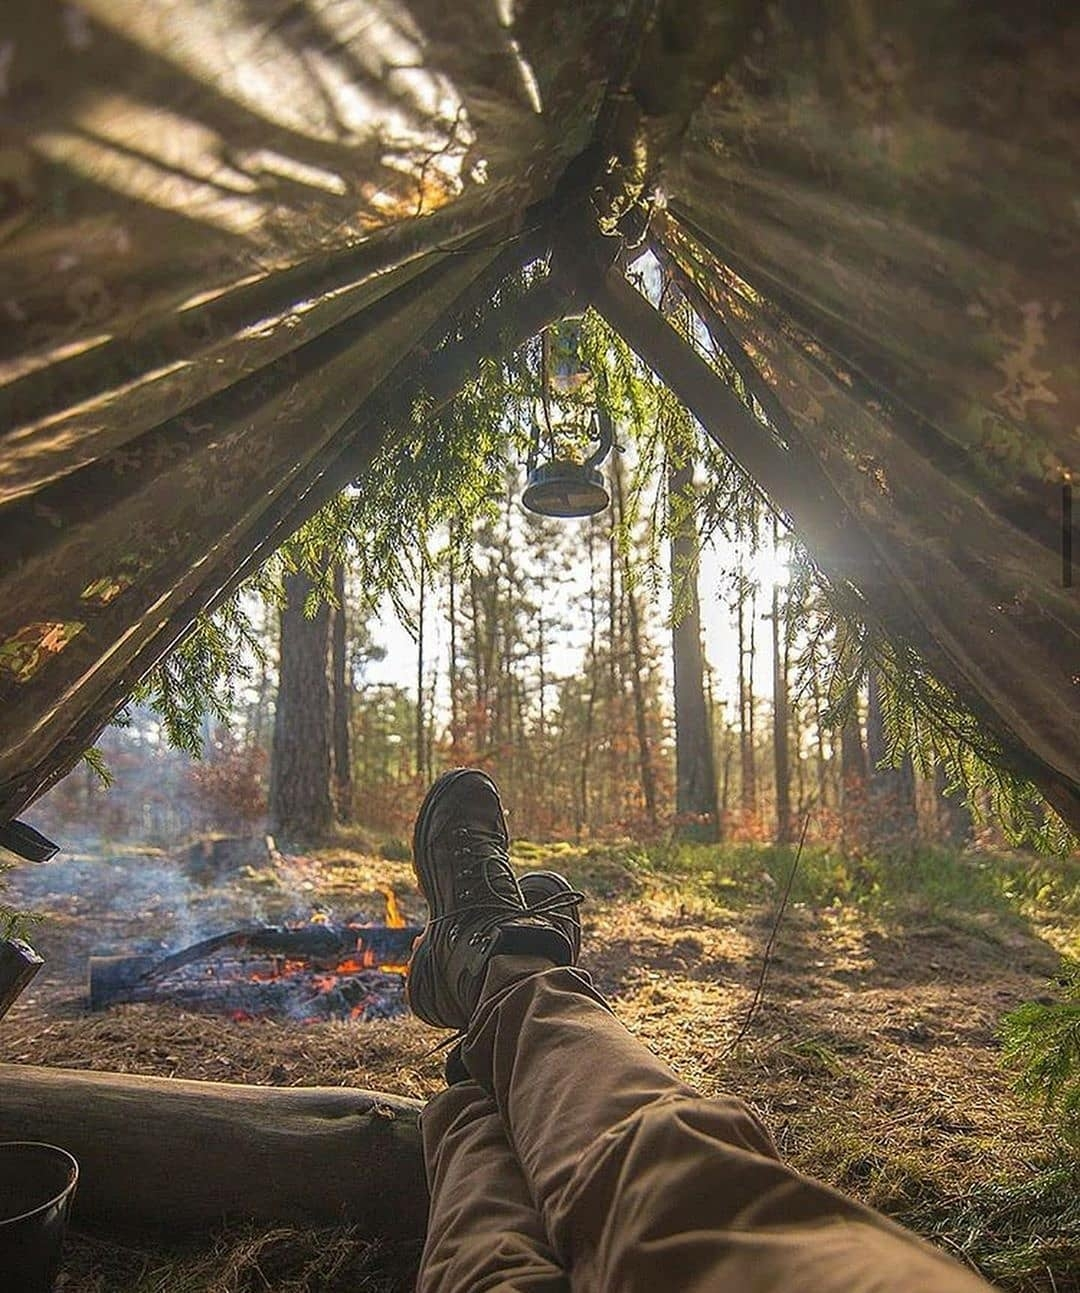 man relaxing in tent